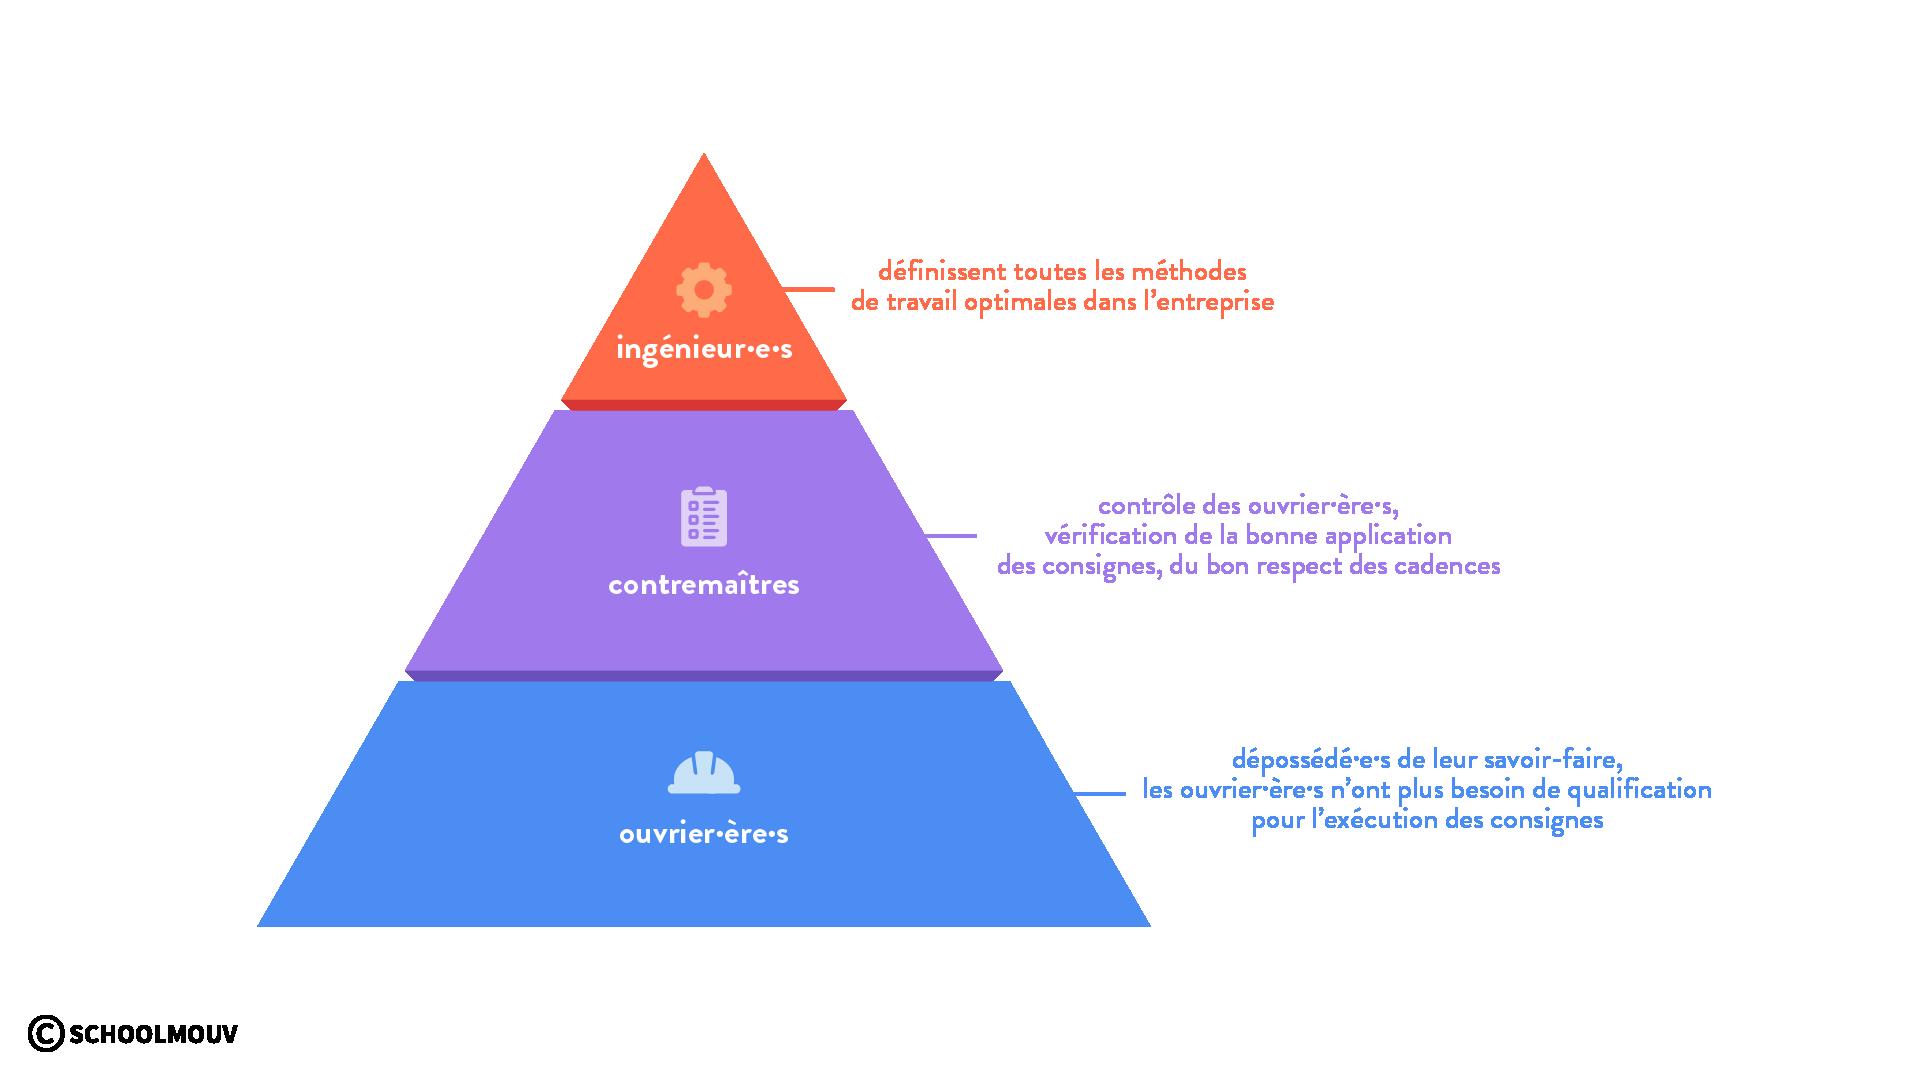 organisation pyramidale taylorisme division verticale du travail